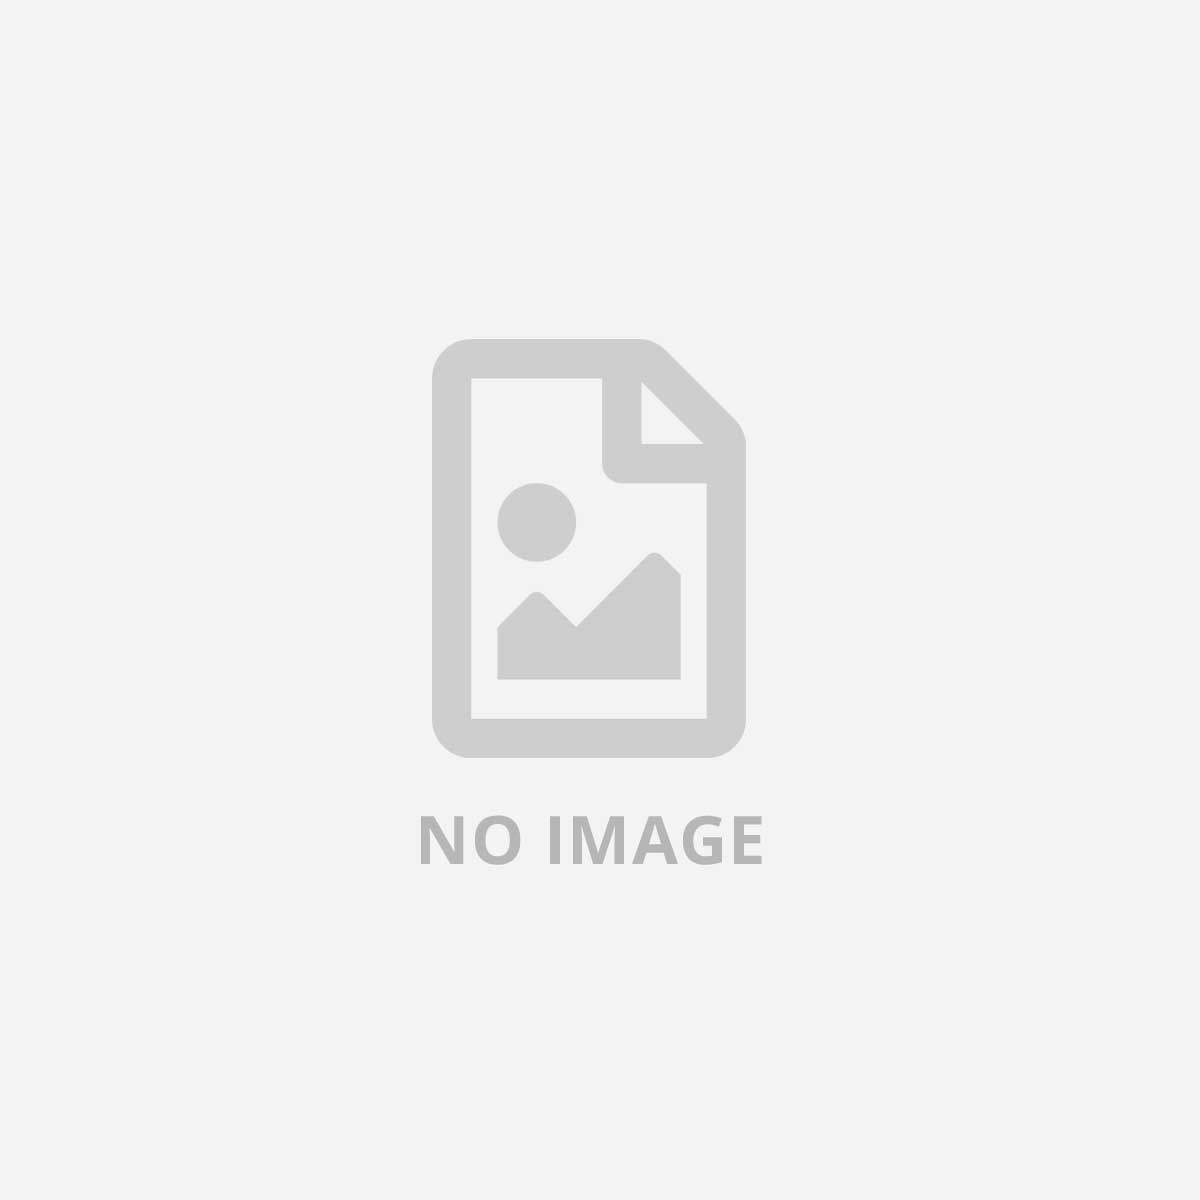 TOSHIBA HDD 3 5P 500GB 64MB 7200RPM